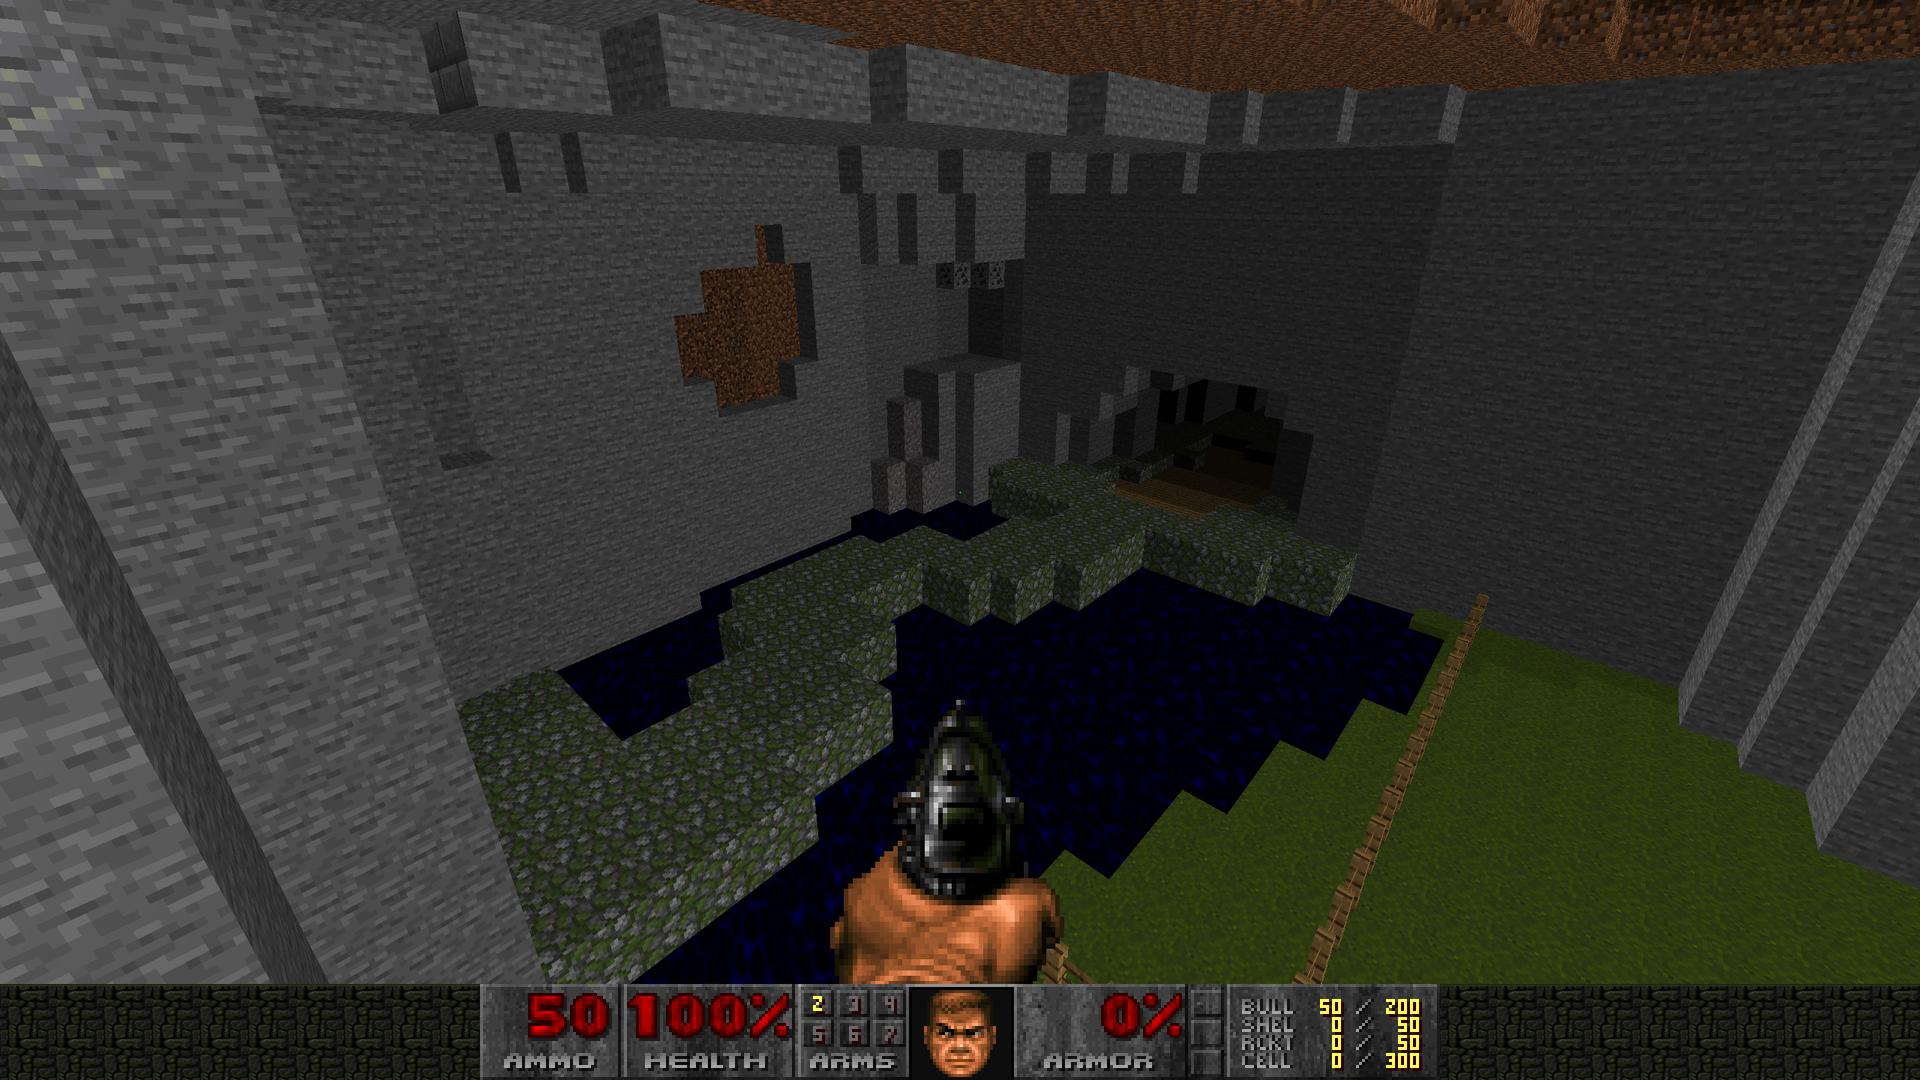 Screenshot_Doom_20200331_144527.png.9539aa02a0d5f7cd47d38cced4e04b88.png